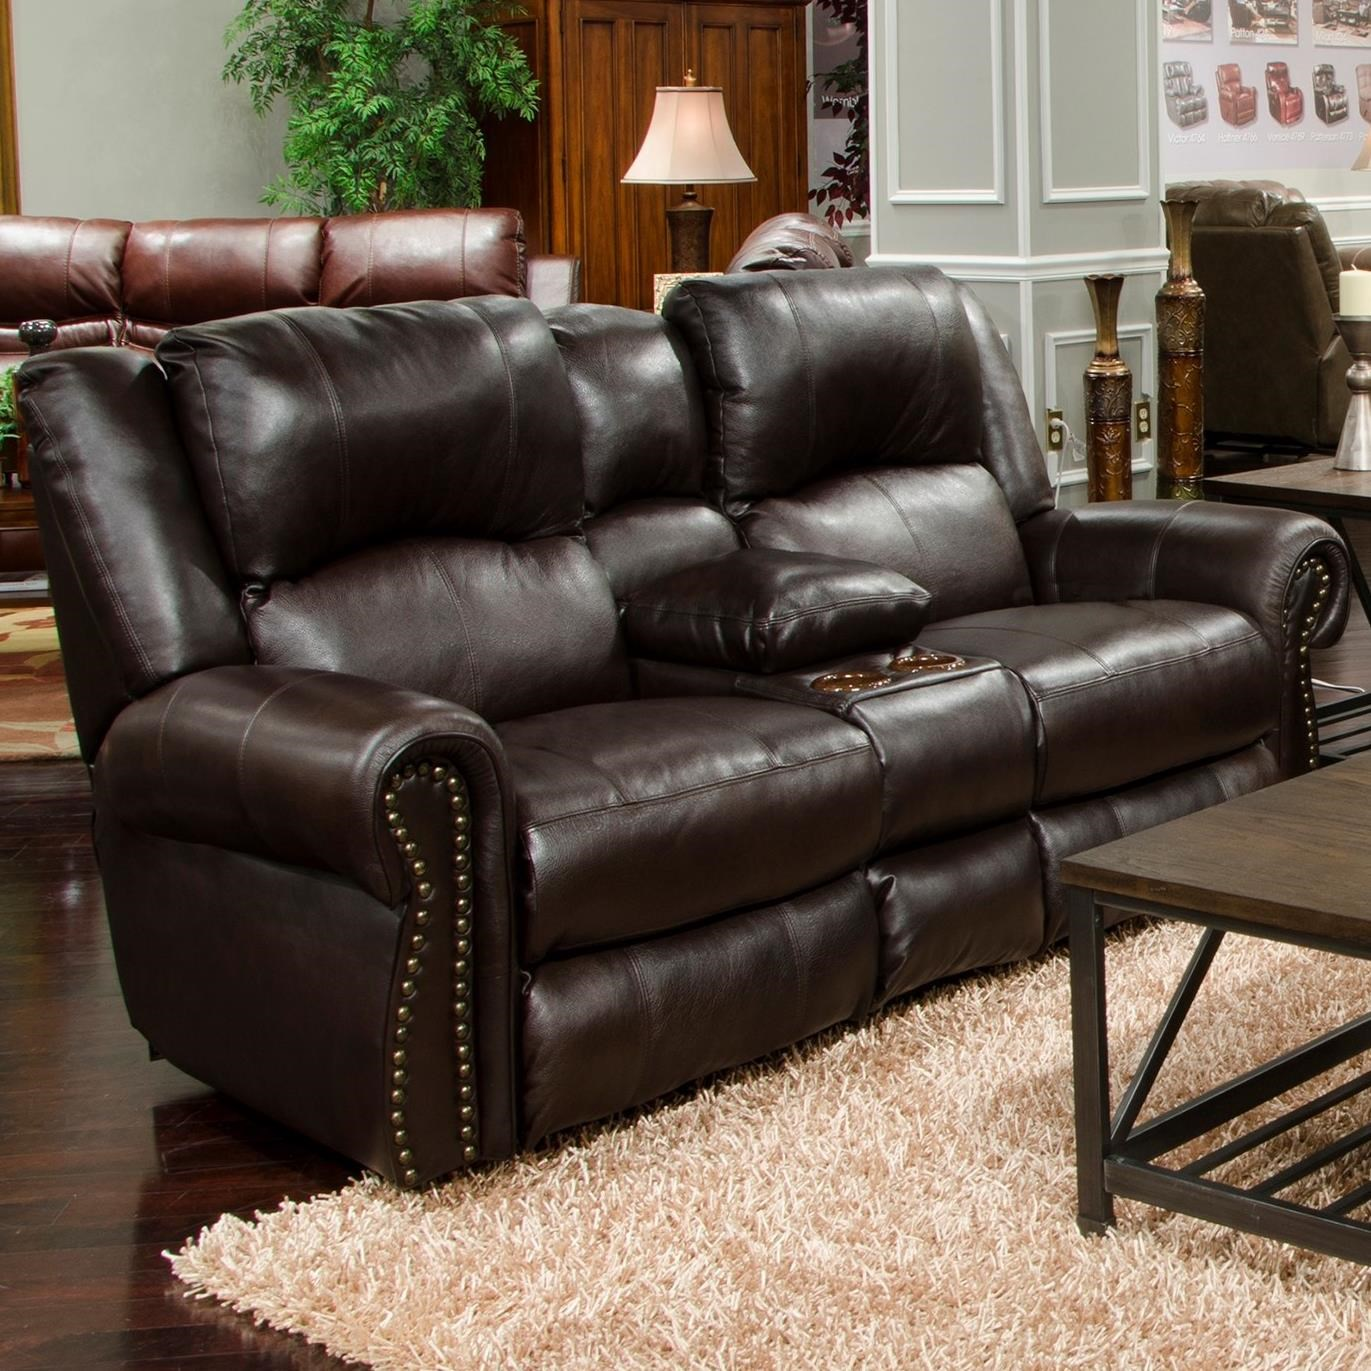 catnapper sofa and loveseat john lewis finlay ii corner messina traditional power reclining lay flat